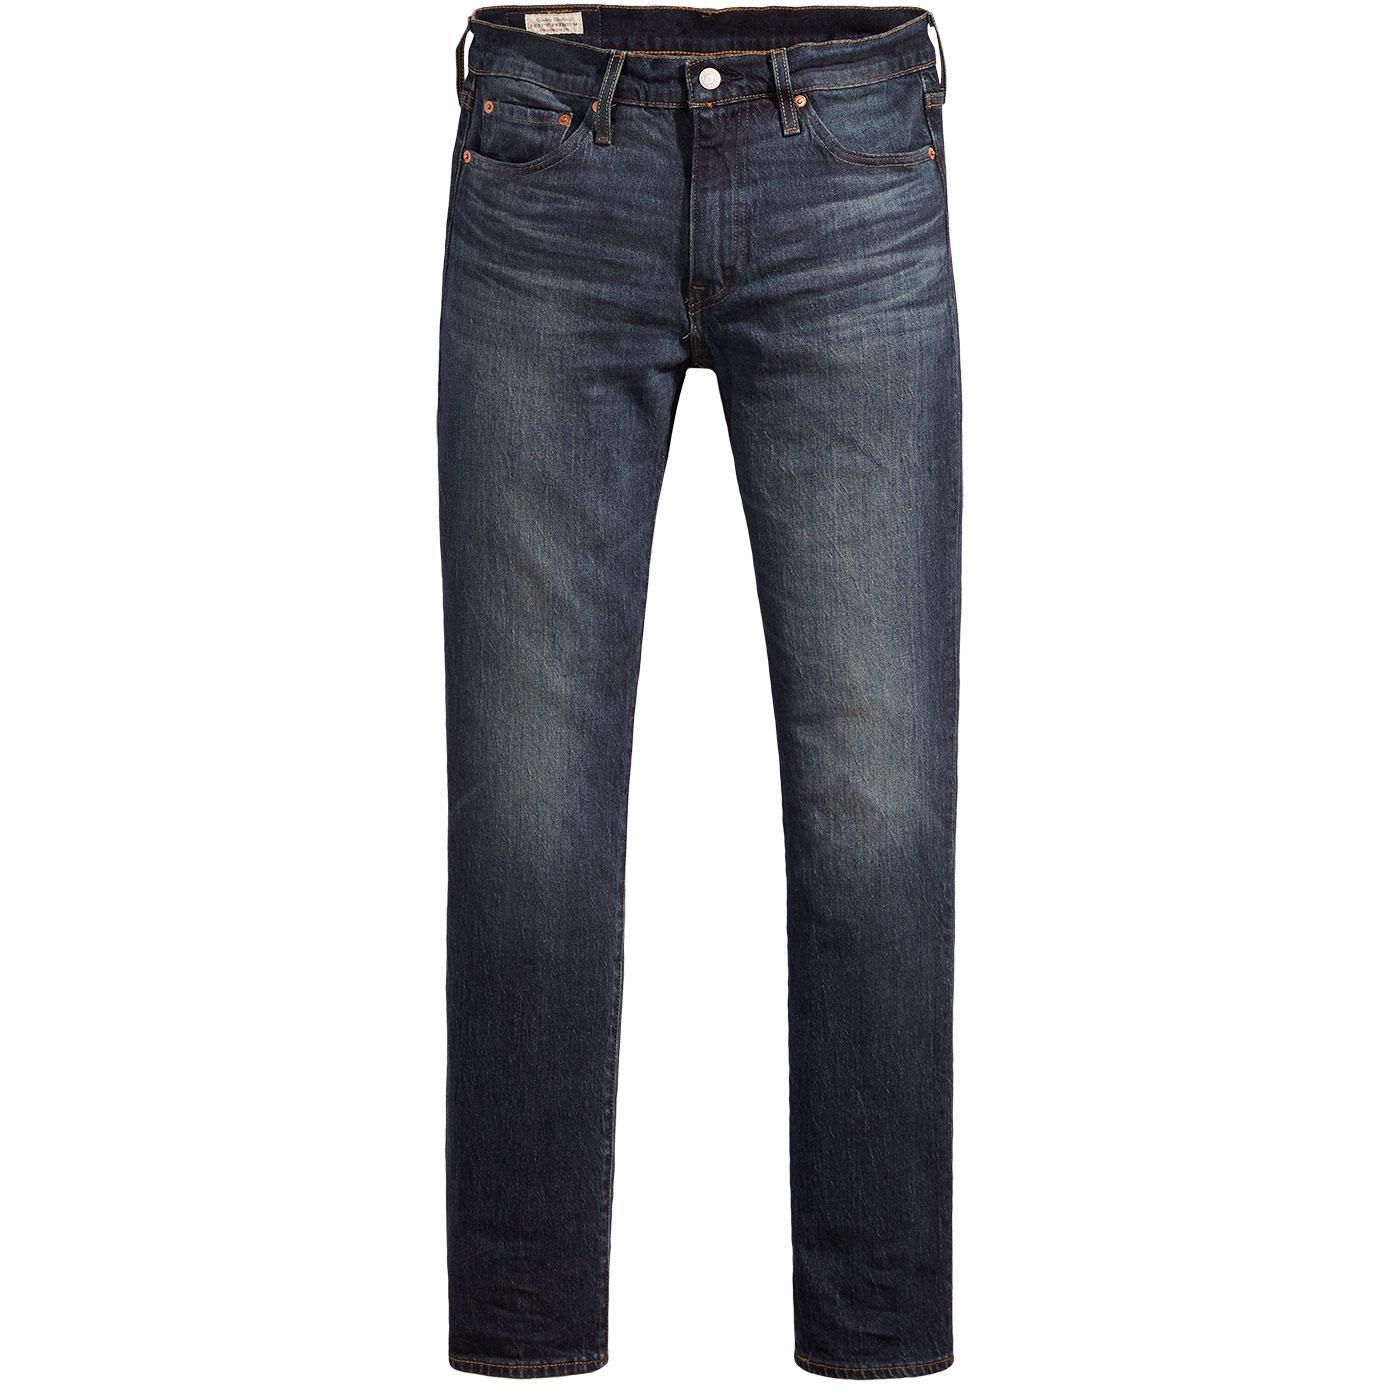 LEVI'S 511 Slim Jeans (Durian Super Tint Overt)